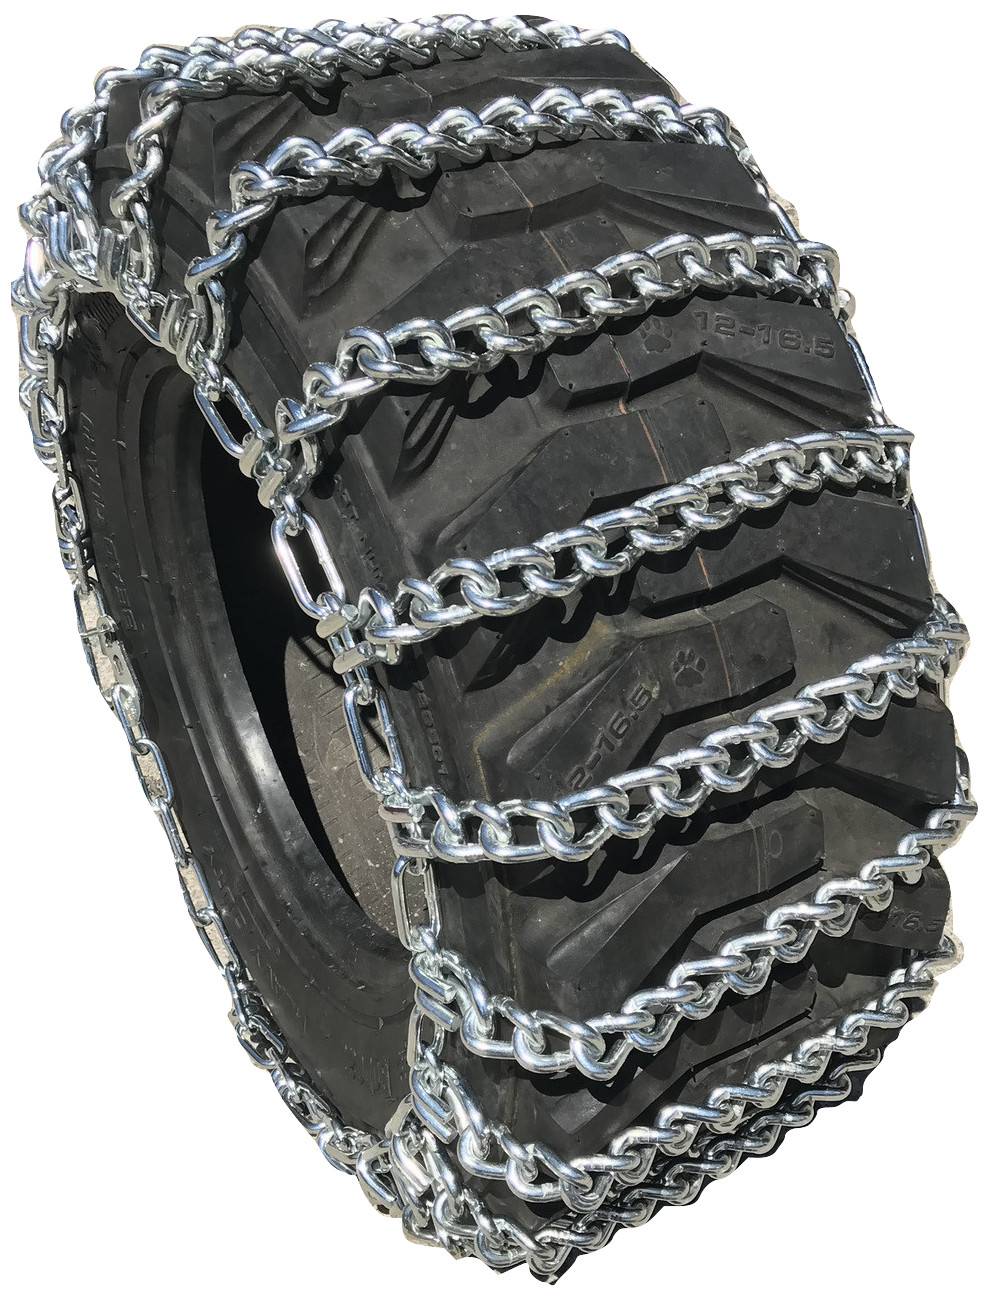 275//45 21 ONORM Diamond Tire Chains Set of 2 TireChain.com 275//45R21